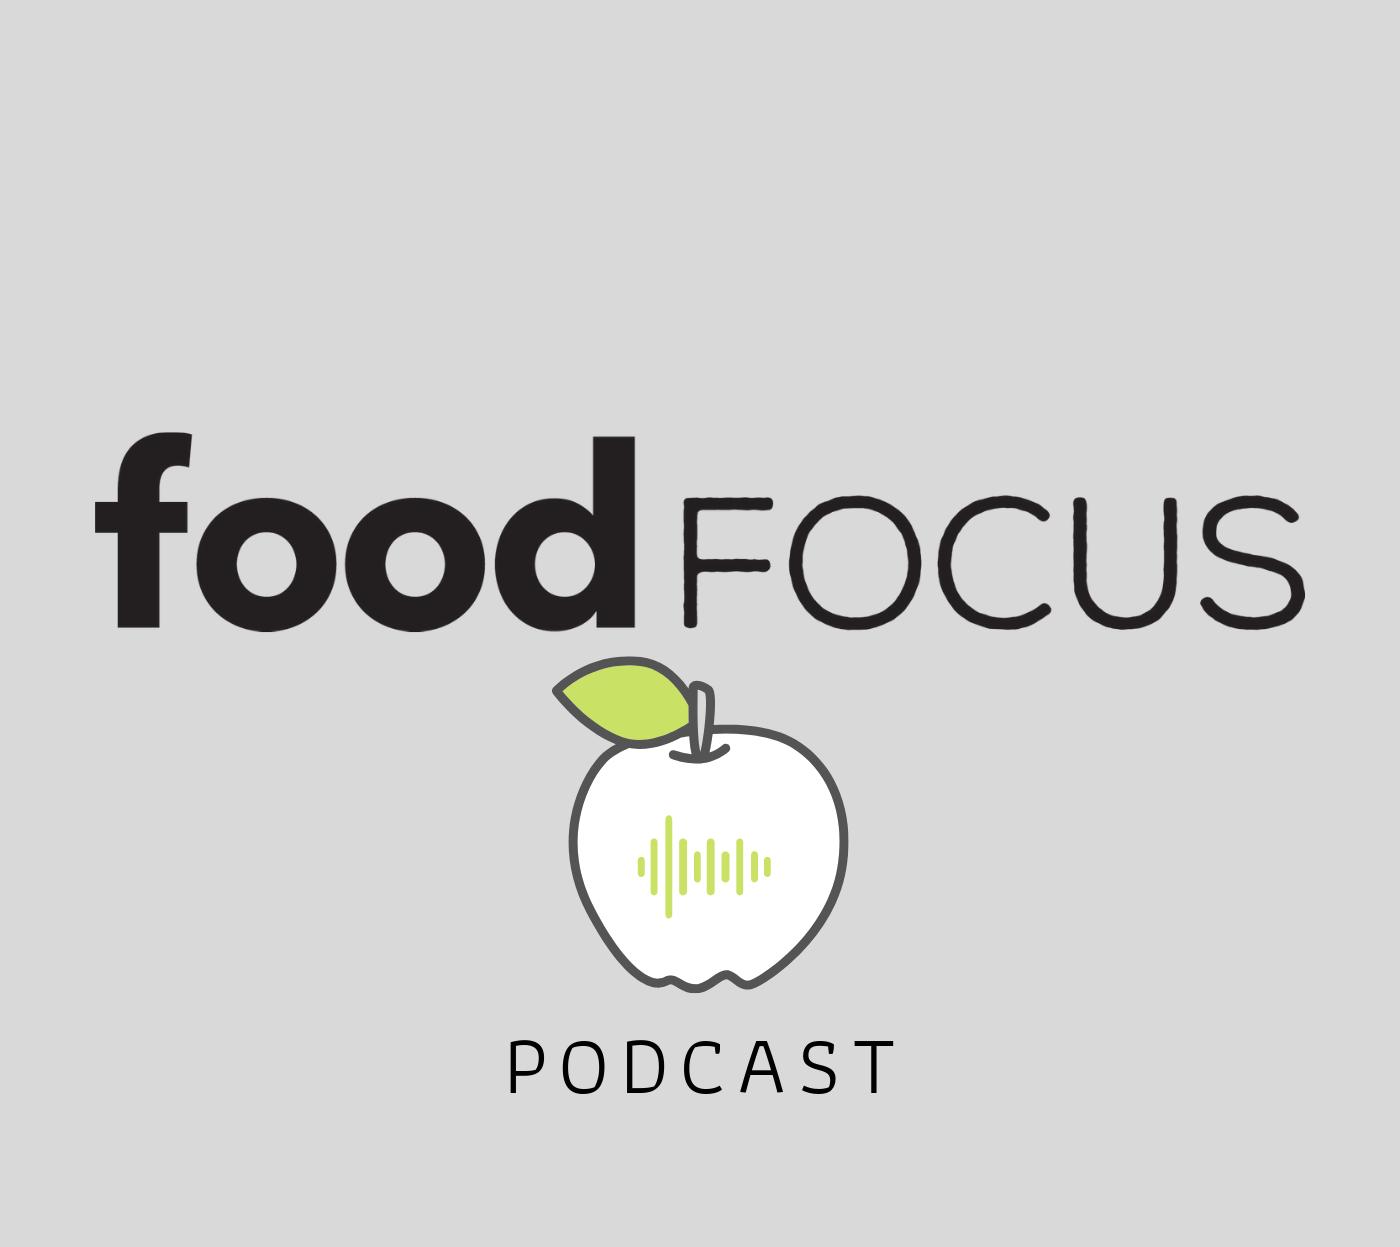 Food Focus